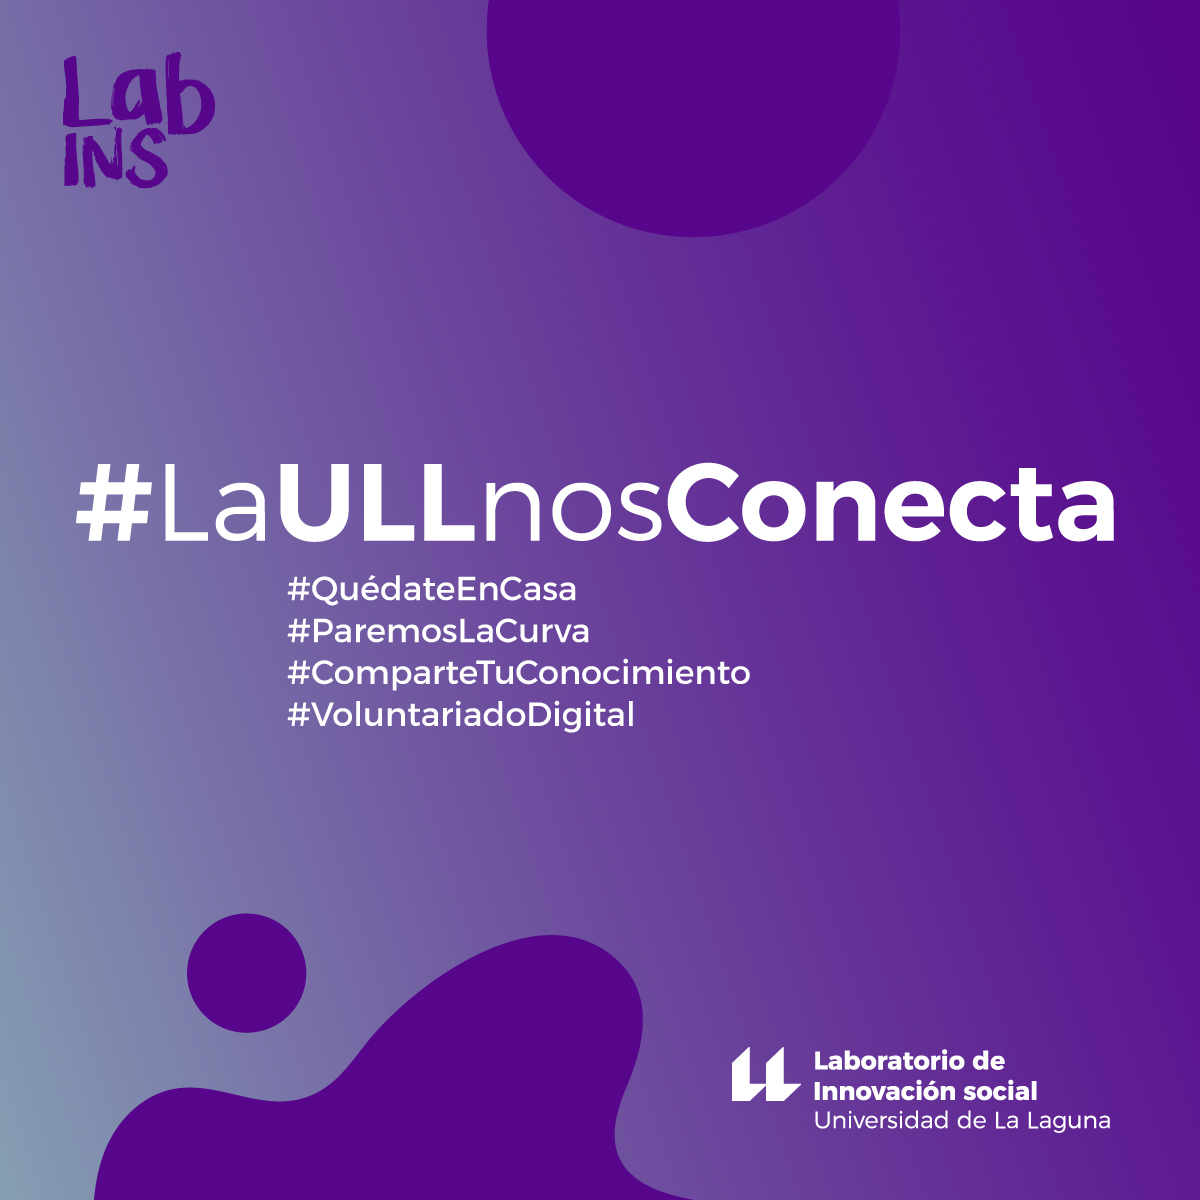 Iniciativas canarias - Labins - La ULL nos conecta - #LaULLnosConecta